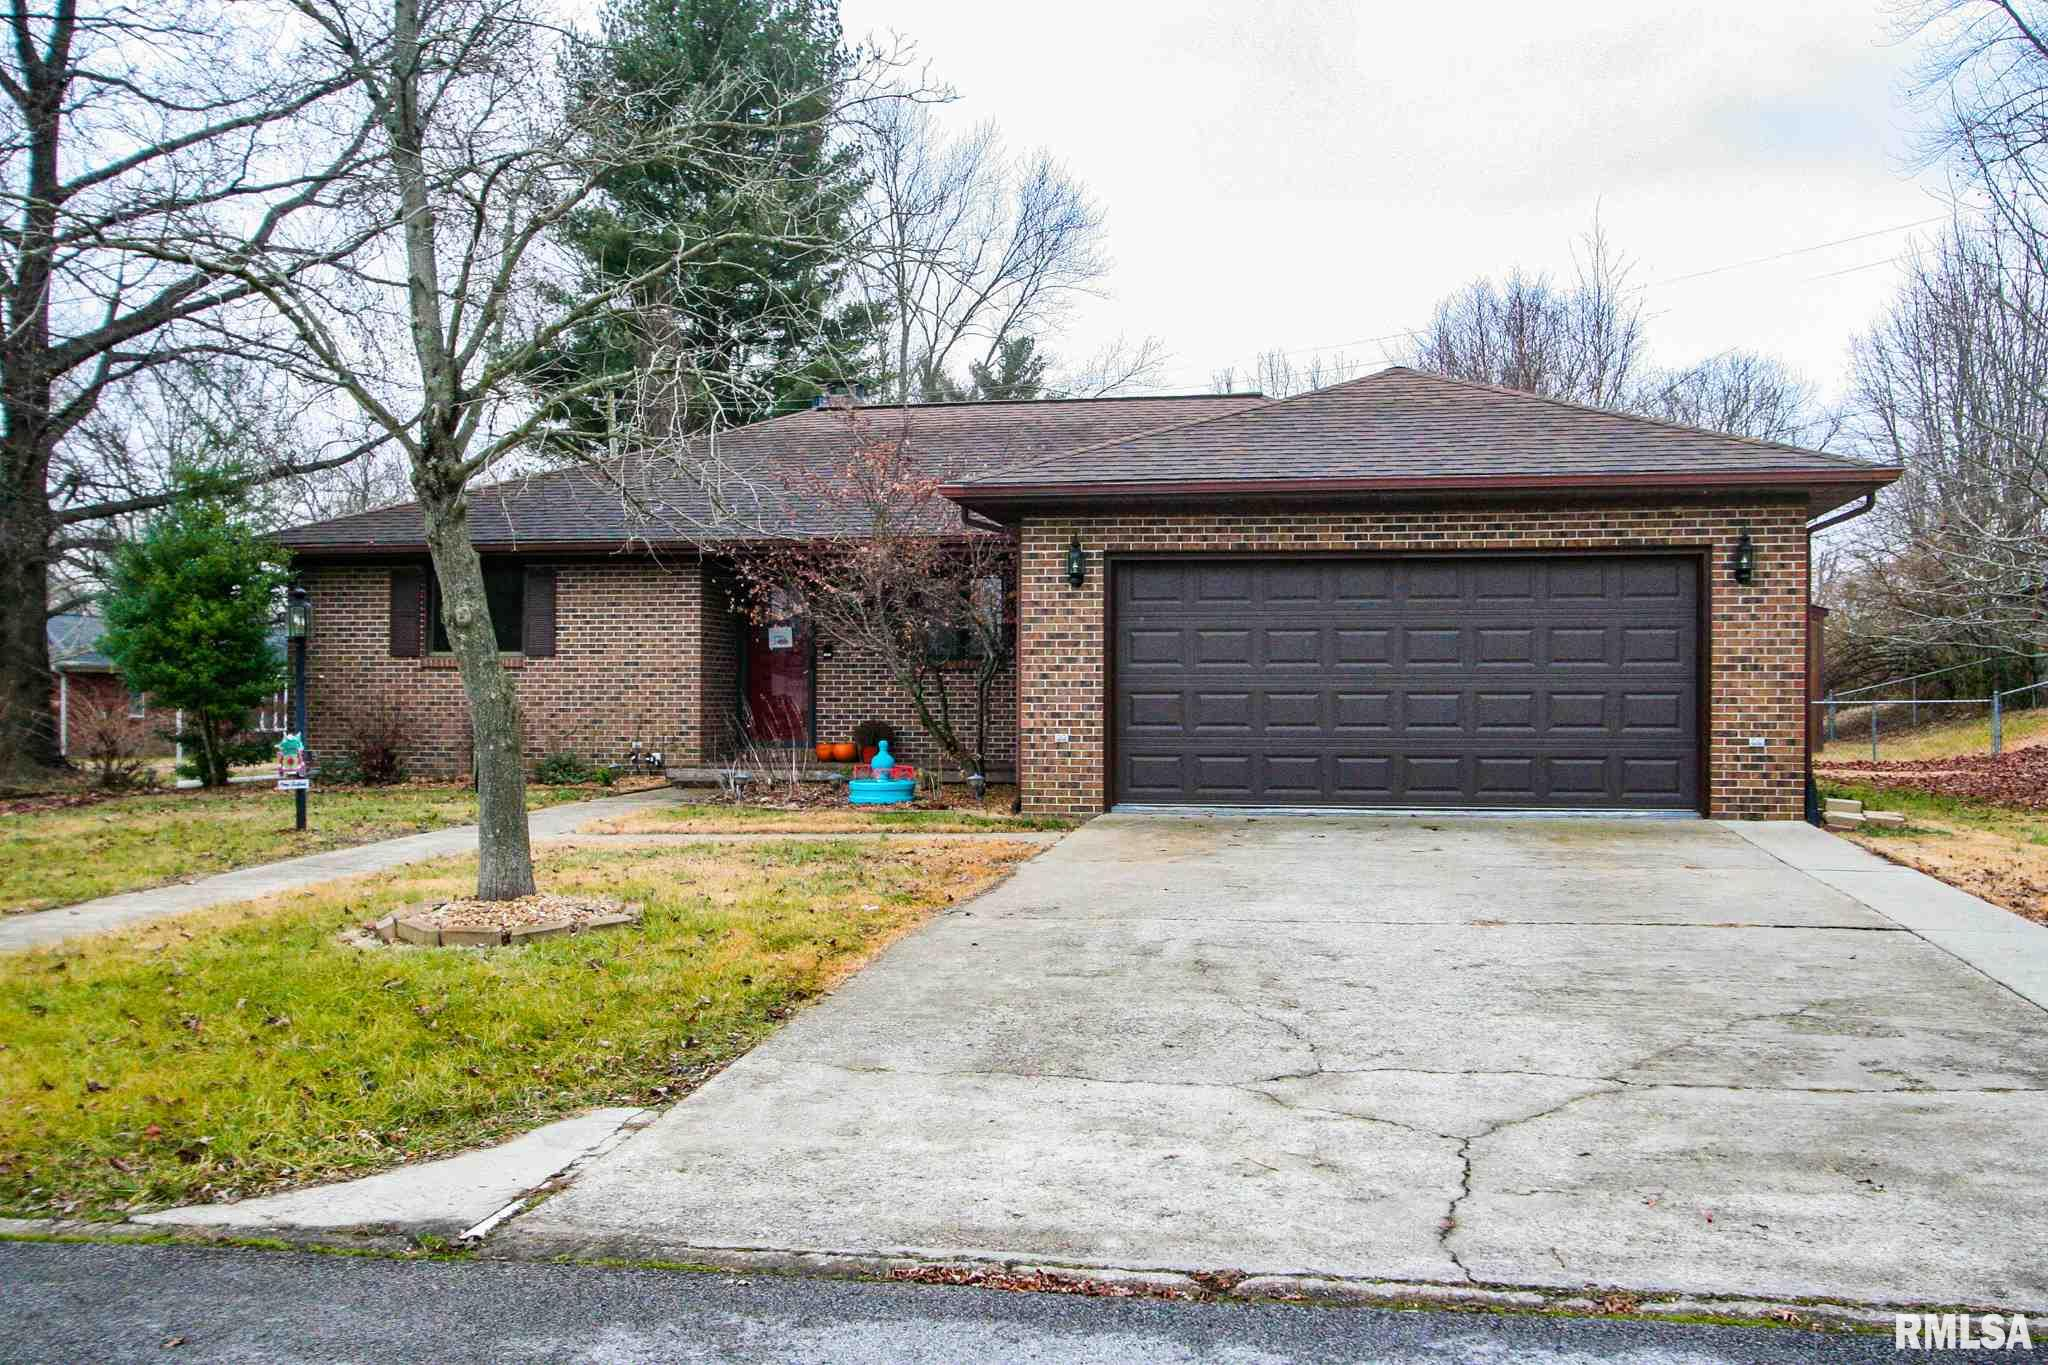 1107 KATHY Property Photo - Carmi, IL real estate listing